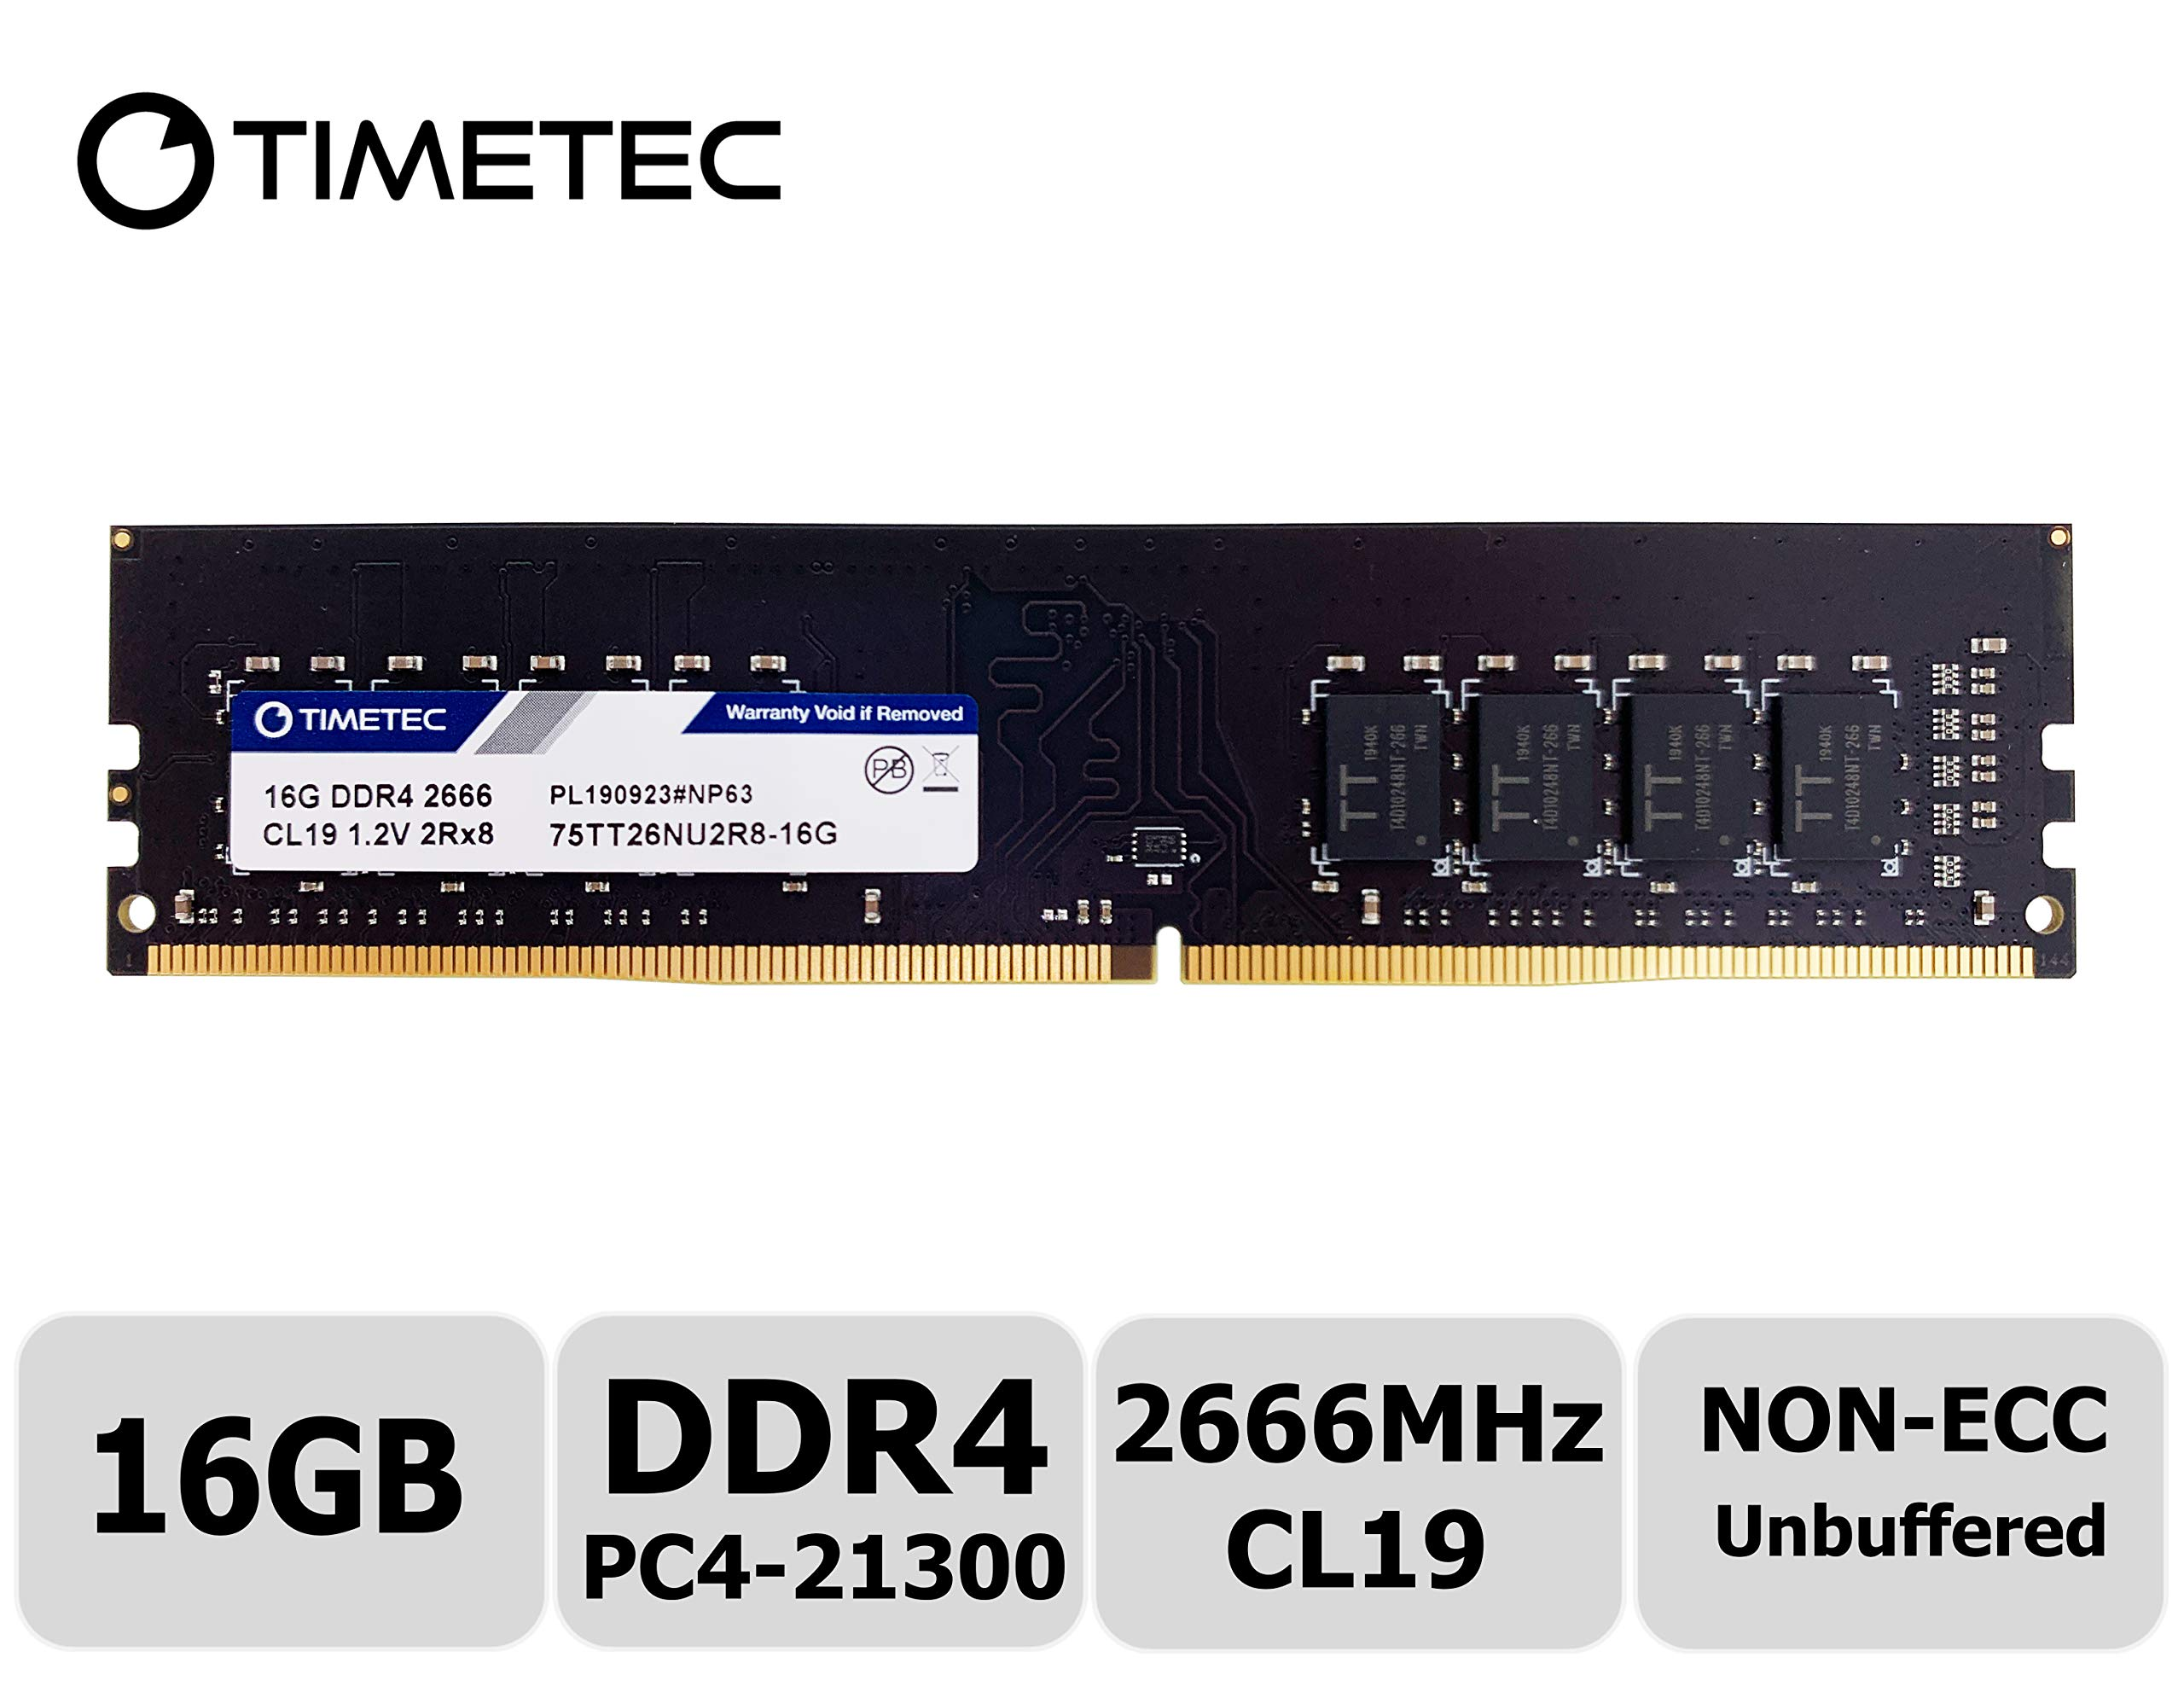 Timetec SUPERMICRO 16GB DDR3 1866MHz PC3-14900 Registered ECC 1.5V CL13 2Rx4 Dual Rank 240 Pin RDIMM Server Memory RAM Module Upgrade 16GB